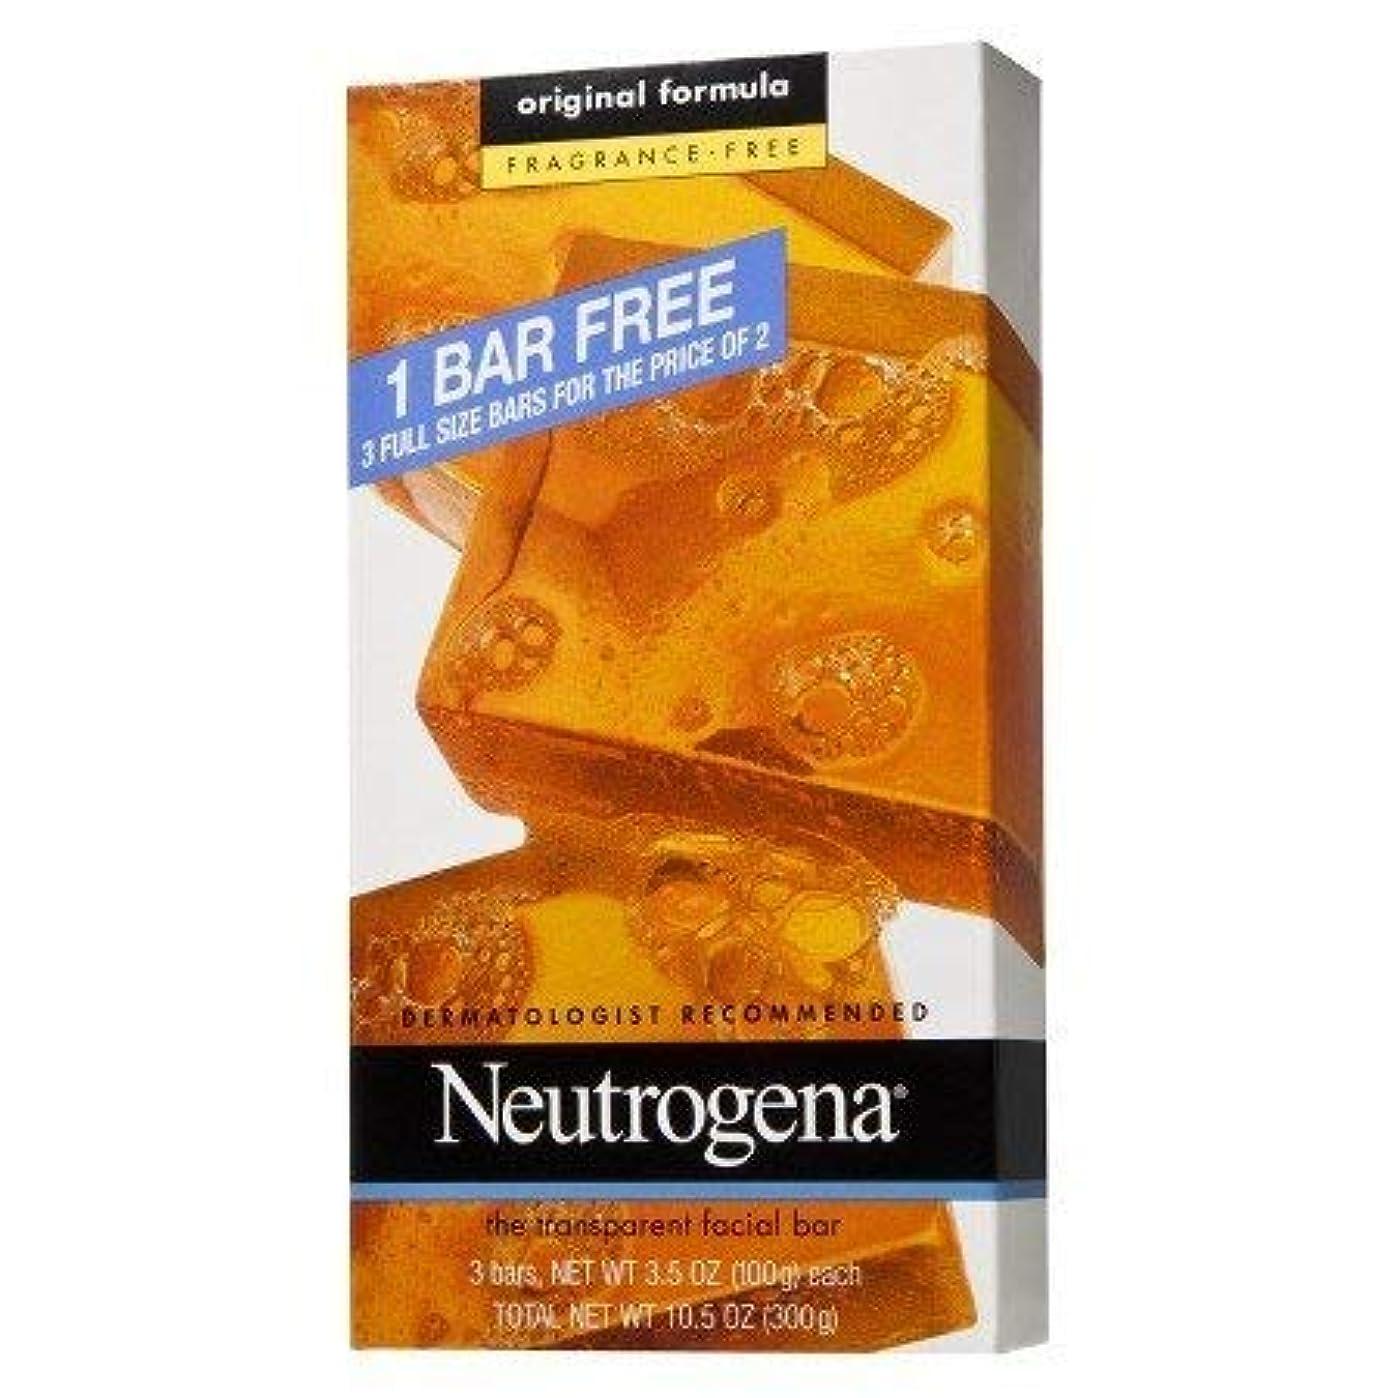 Neutrogena Facial Cleansing Bar ニュートロジーナ洗顔用石鹸フレグランスフリー 100gx3個 [並行輸入品]